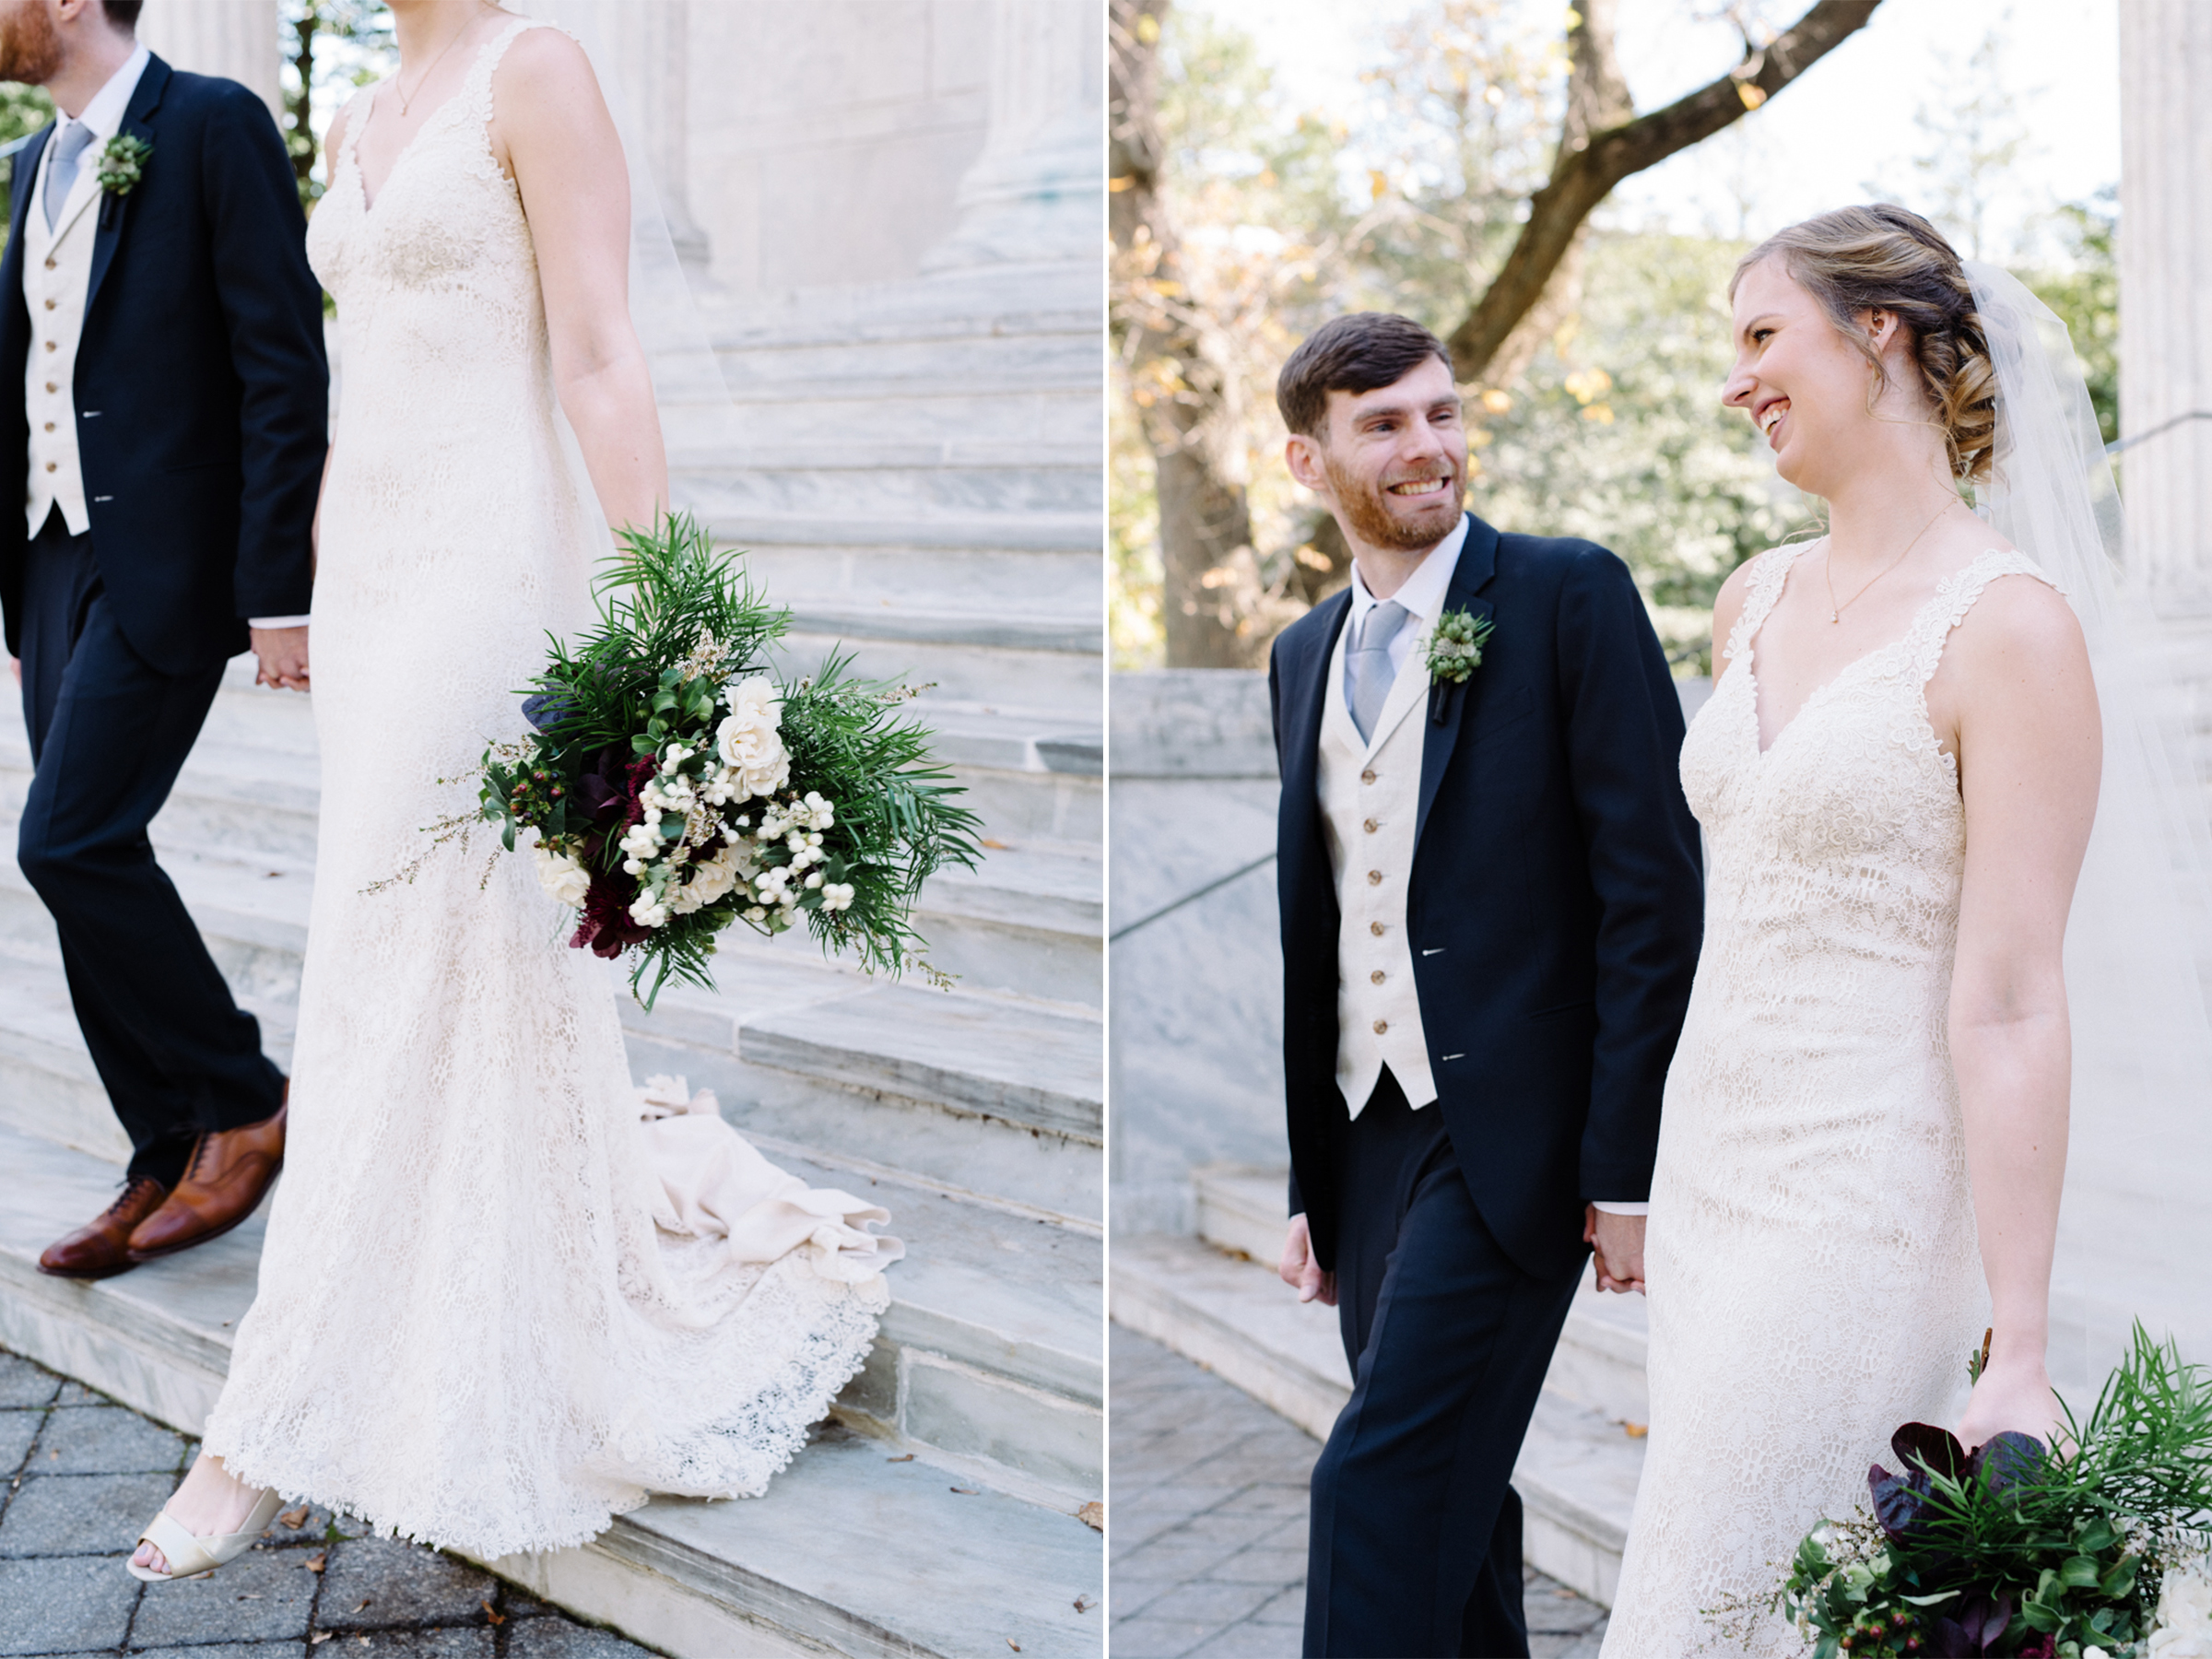 Chelsea+James- Bride and Groom Portraits- Princeton University Campus Wedding 5- Olivia Christina Photo.jpg